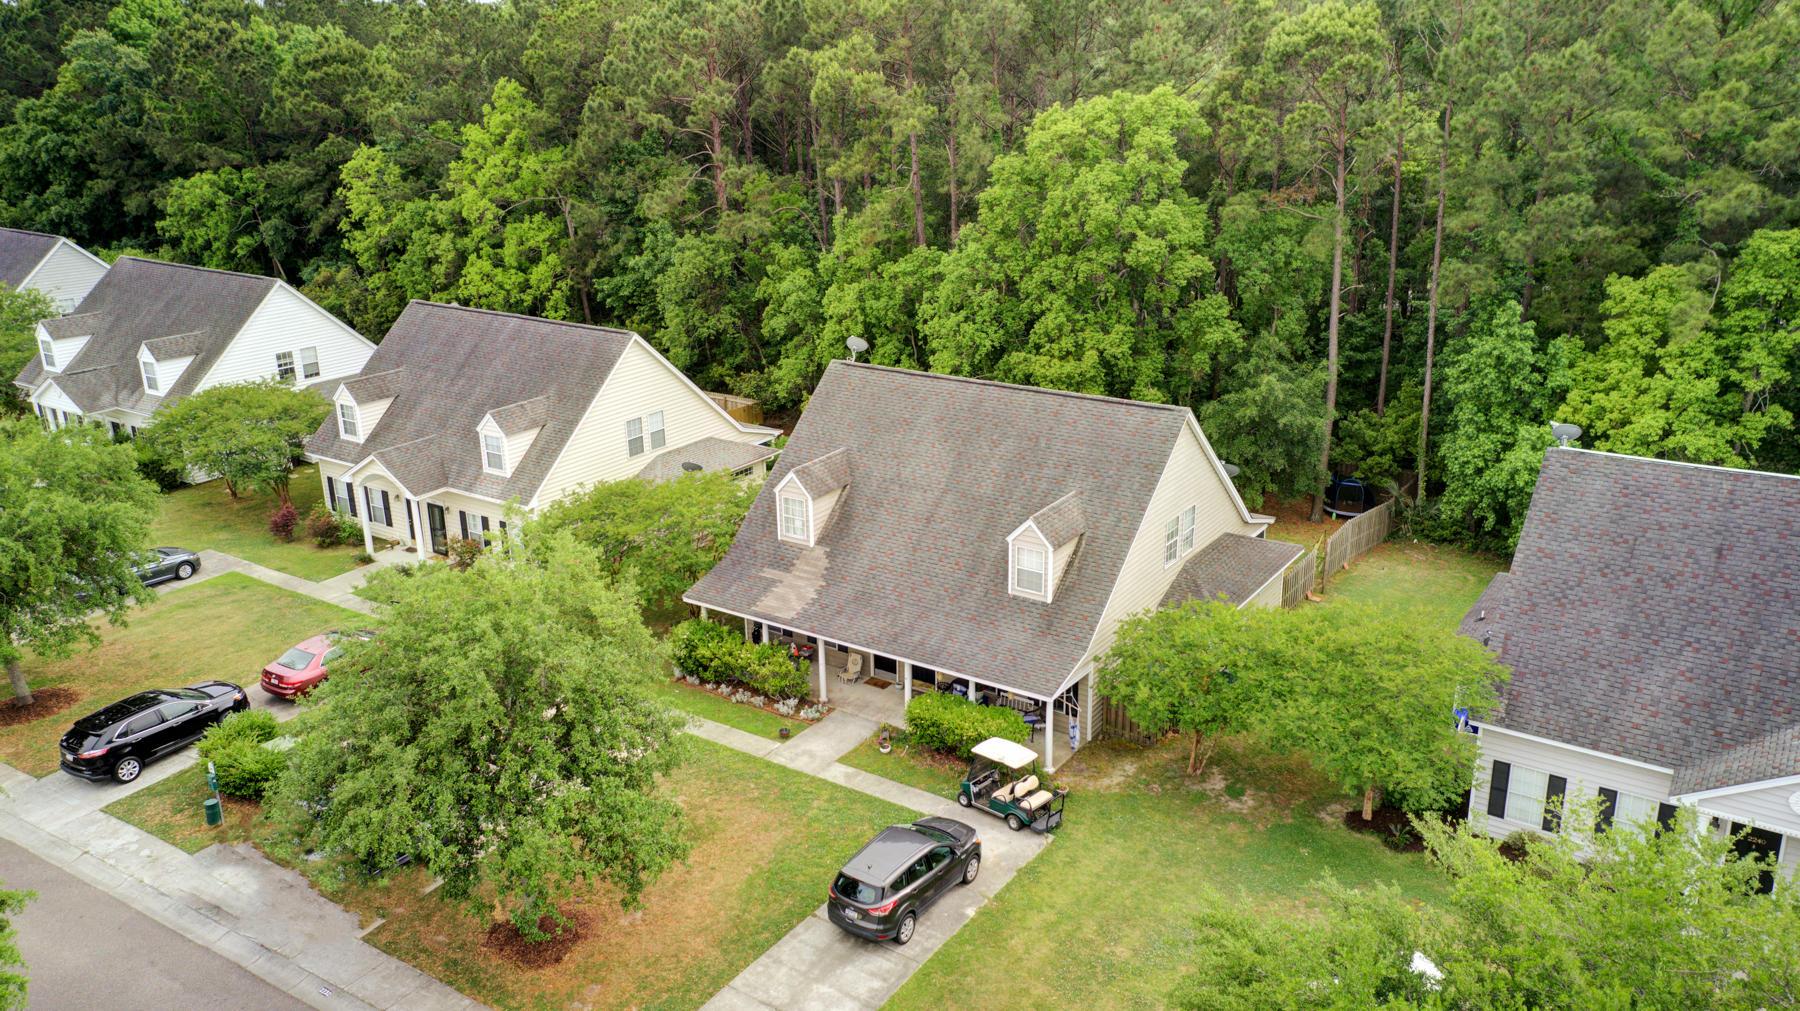 Dunes West Homes For Sale - 2232 Kings Gate, Mount Pleasant, SC - 5